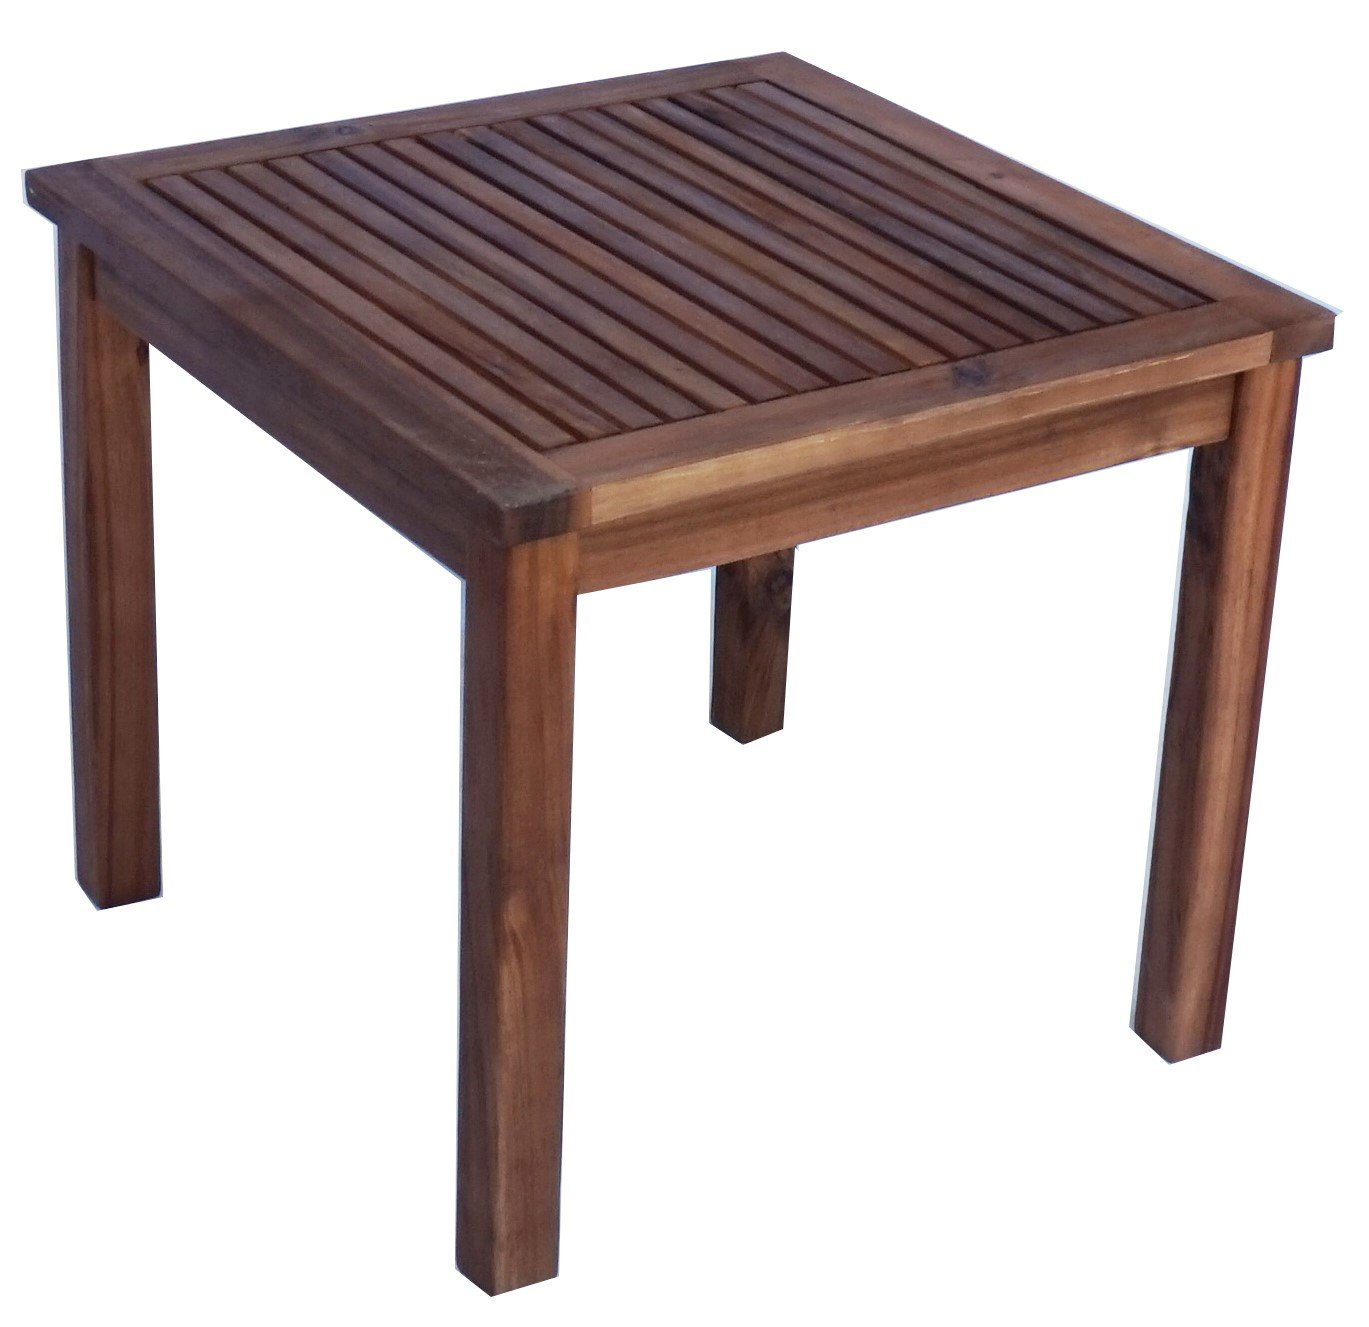 Zen Garden Eucalyptus Square Side Table, 19'' x 19'' x 17.5'', Natual Wood Finish, Natural Wood